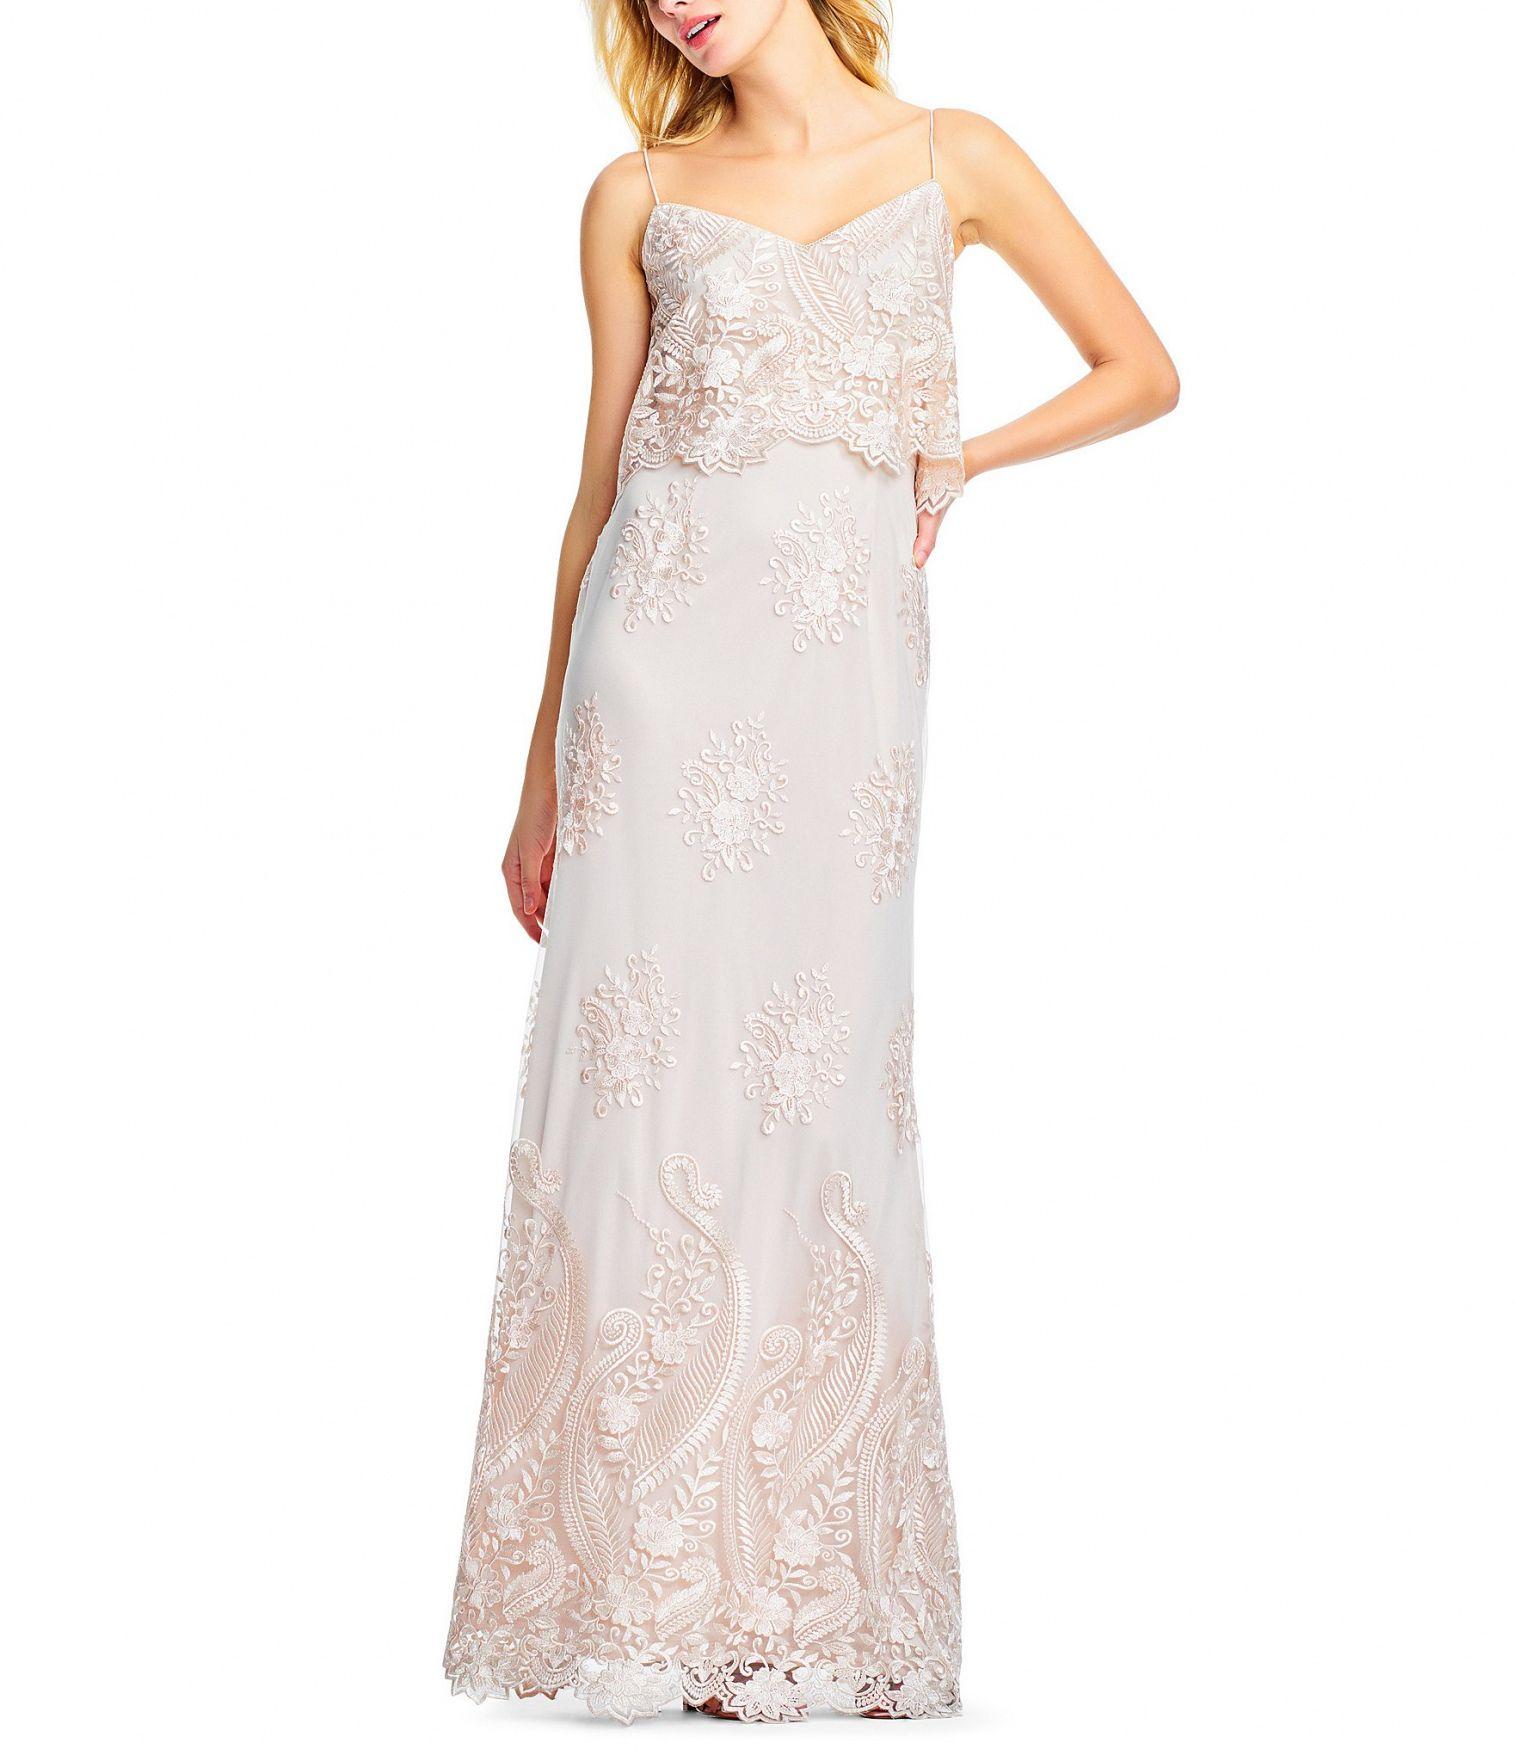 20+ Wedding Dresses at Dillards - Dressy Dresses for Weddings Check ...